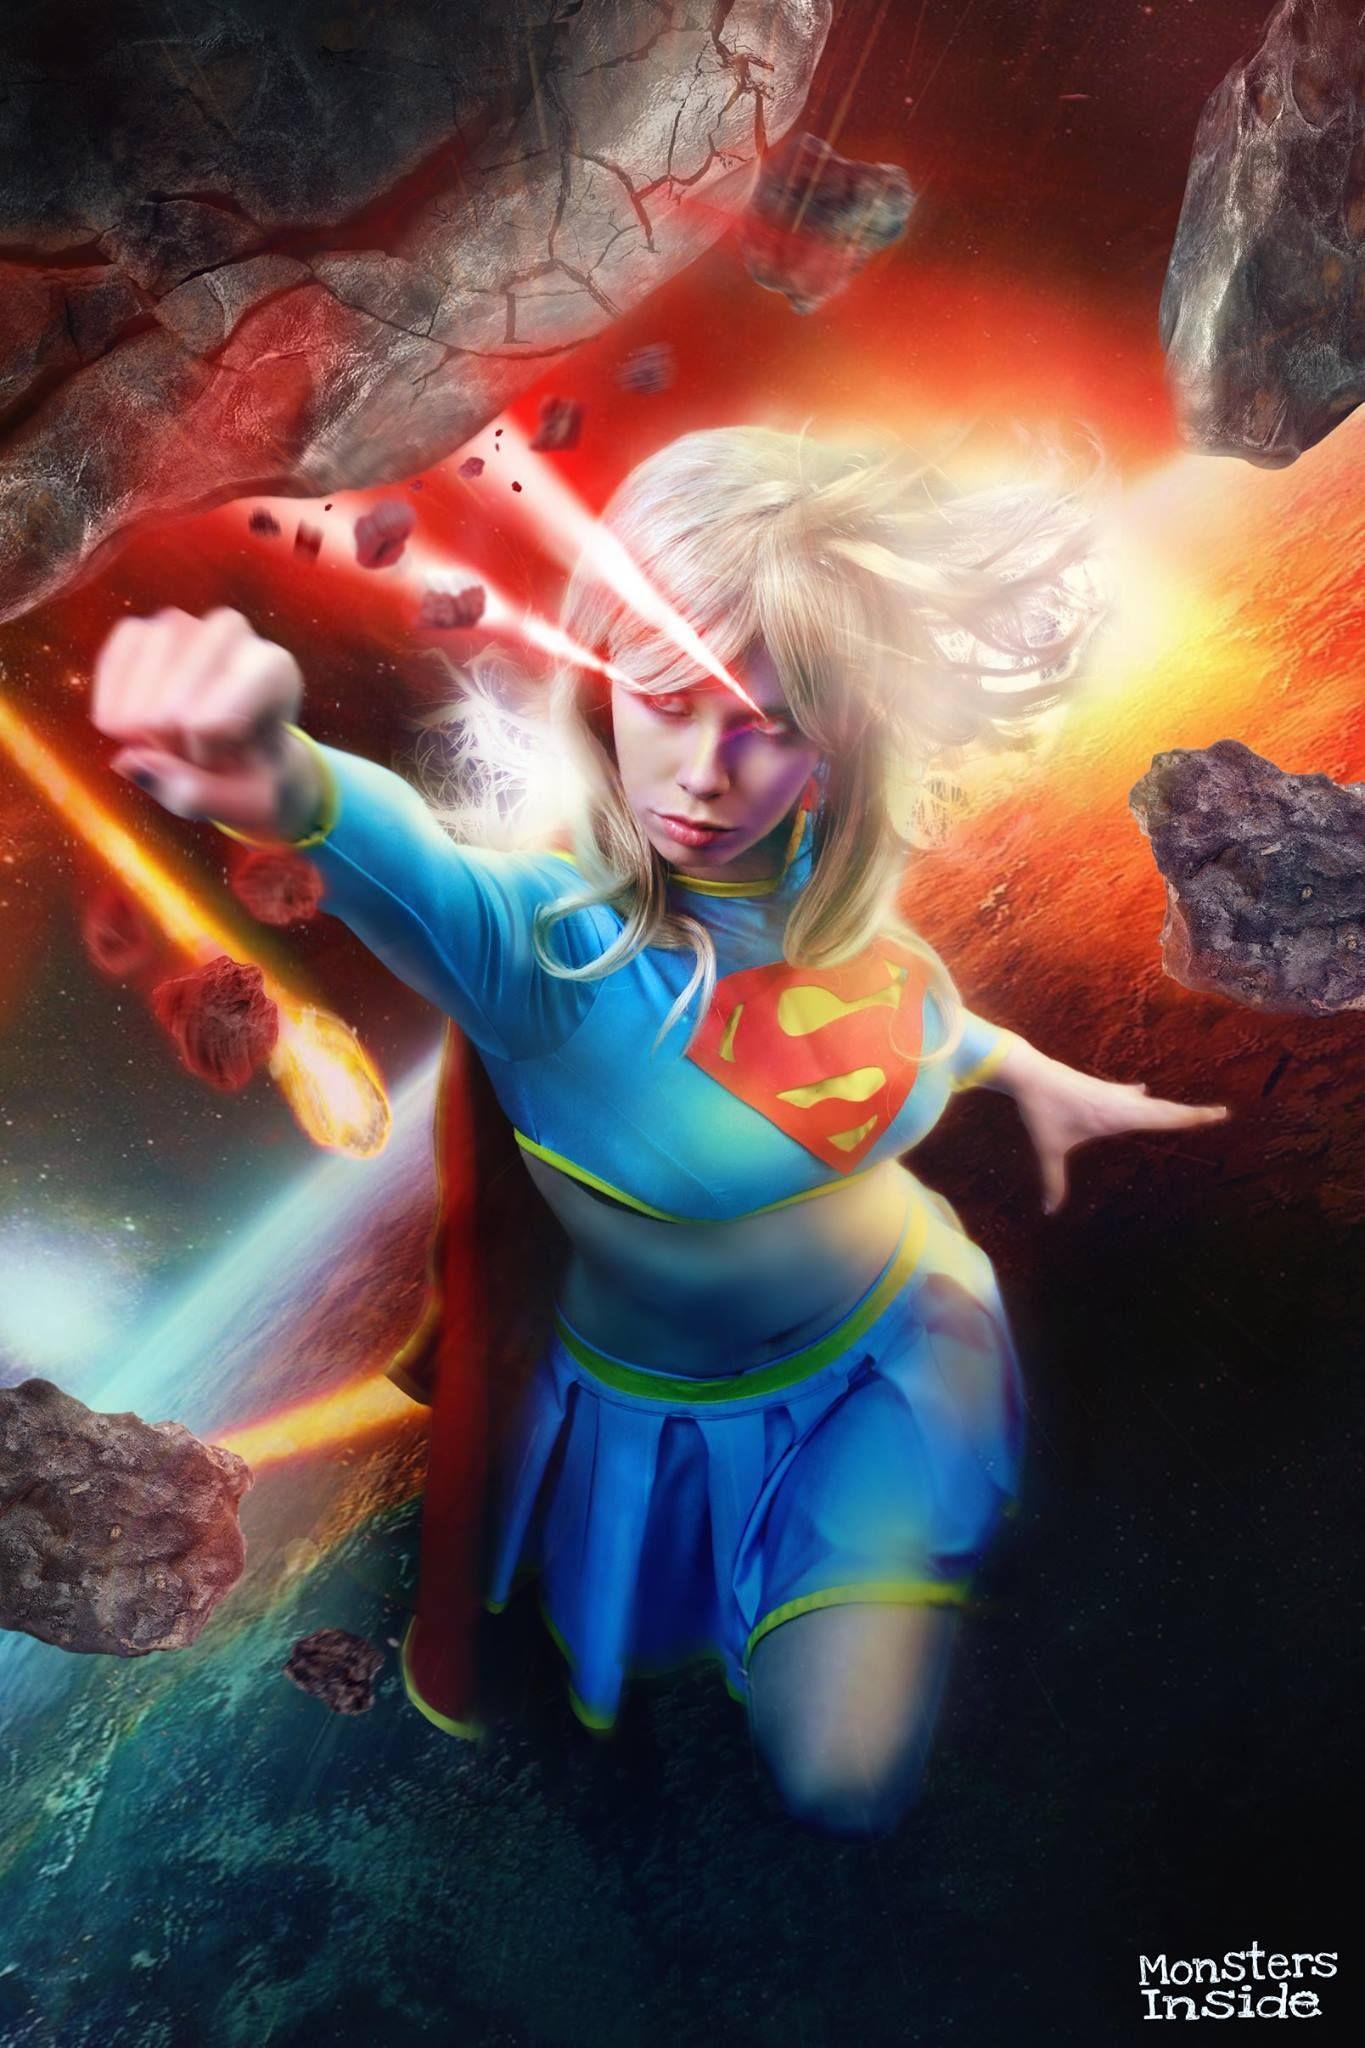 Character: Supergirl (Kara Zor-El) / From: DC Comics 'Supergirl' & 'Action Comics' / Cosplayer: Florencia Muir (aka Florencia Sofen Cosplay, aka FioreSofen) / Photo: Monsters Inside - Studio